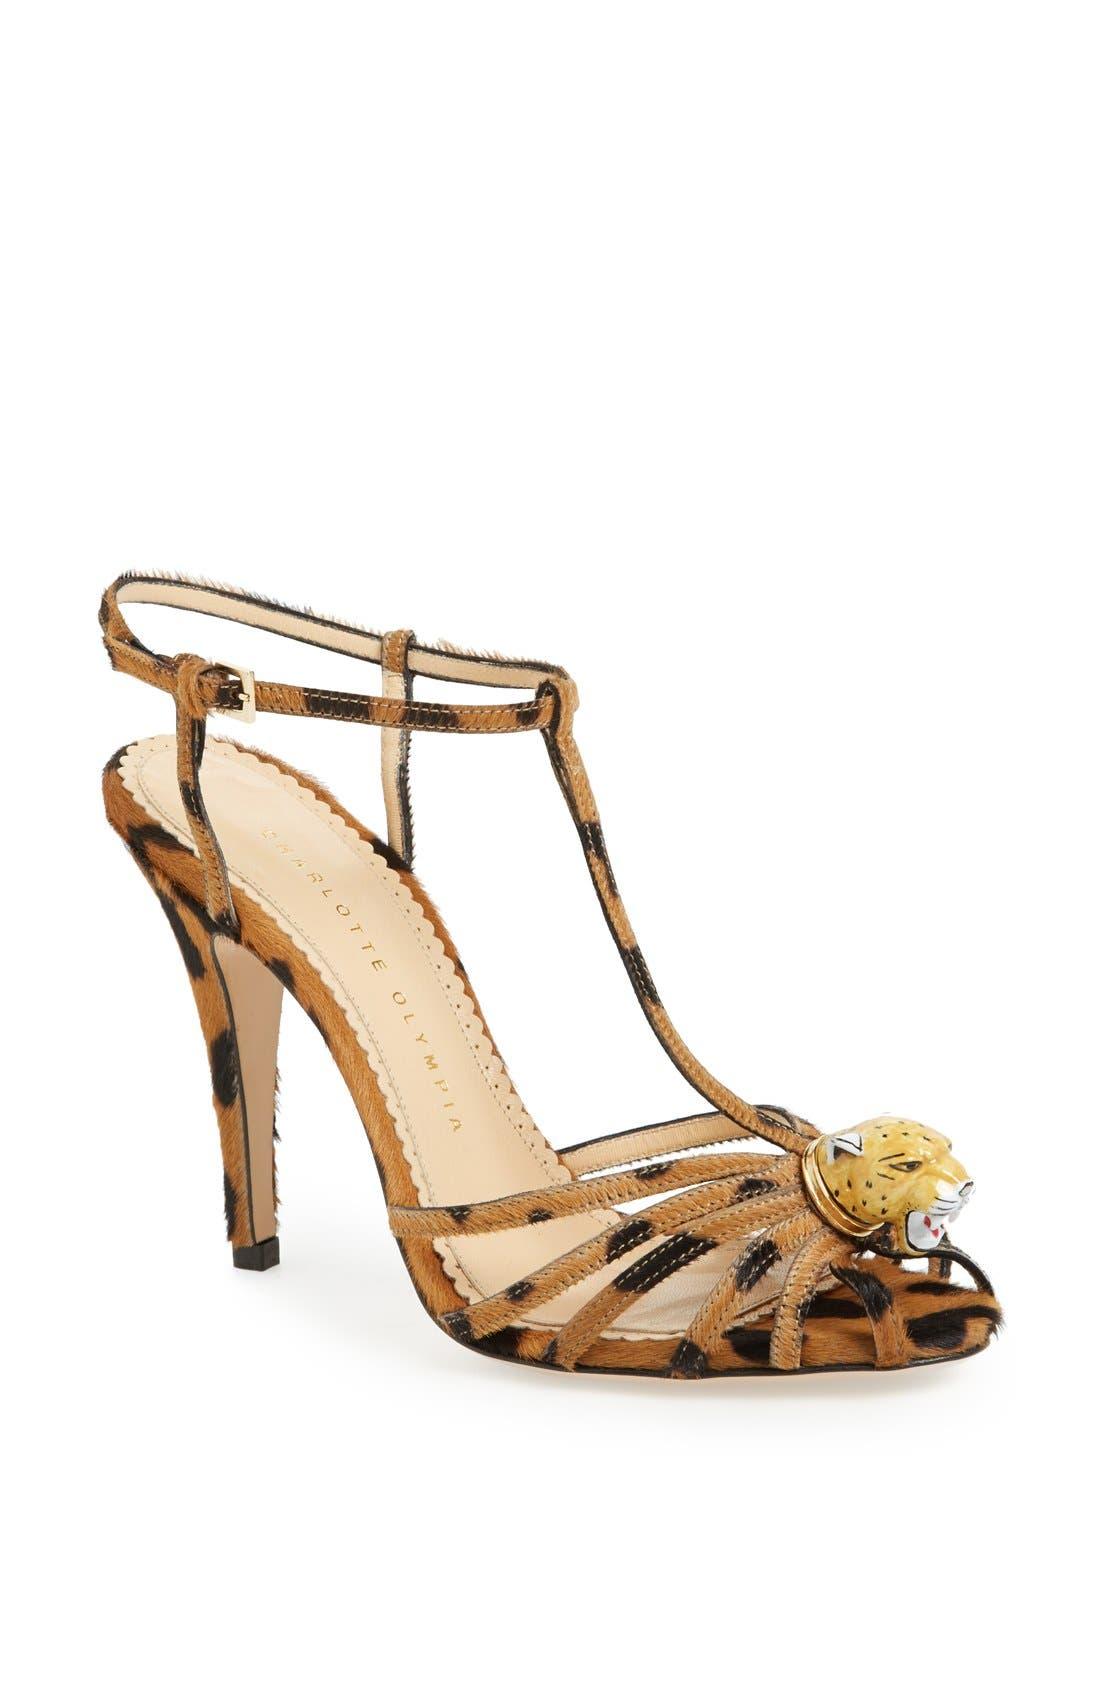 Main Image - Charlotte Olympia 'Clio' Calf Hair Sandal